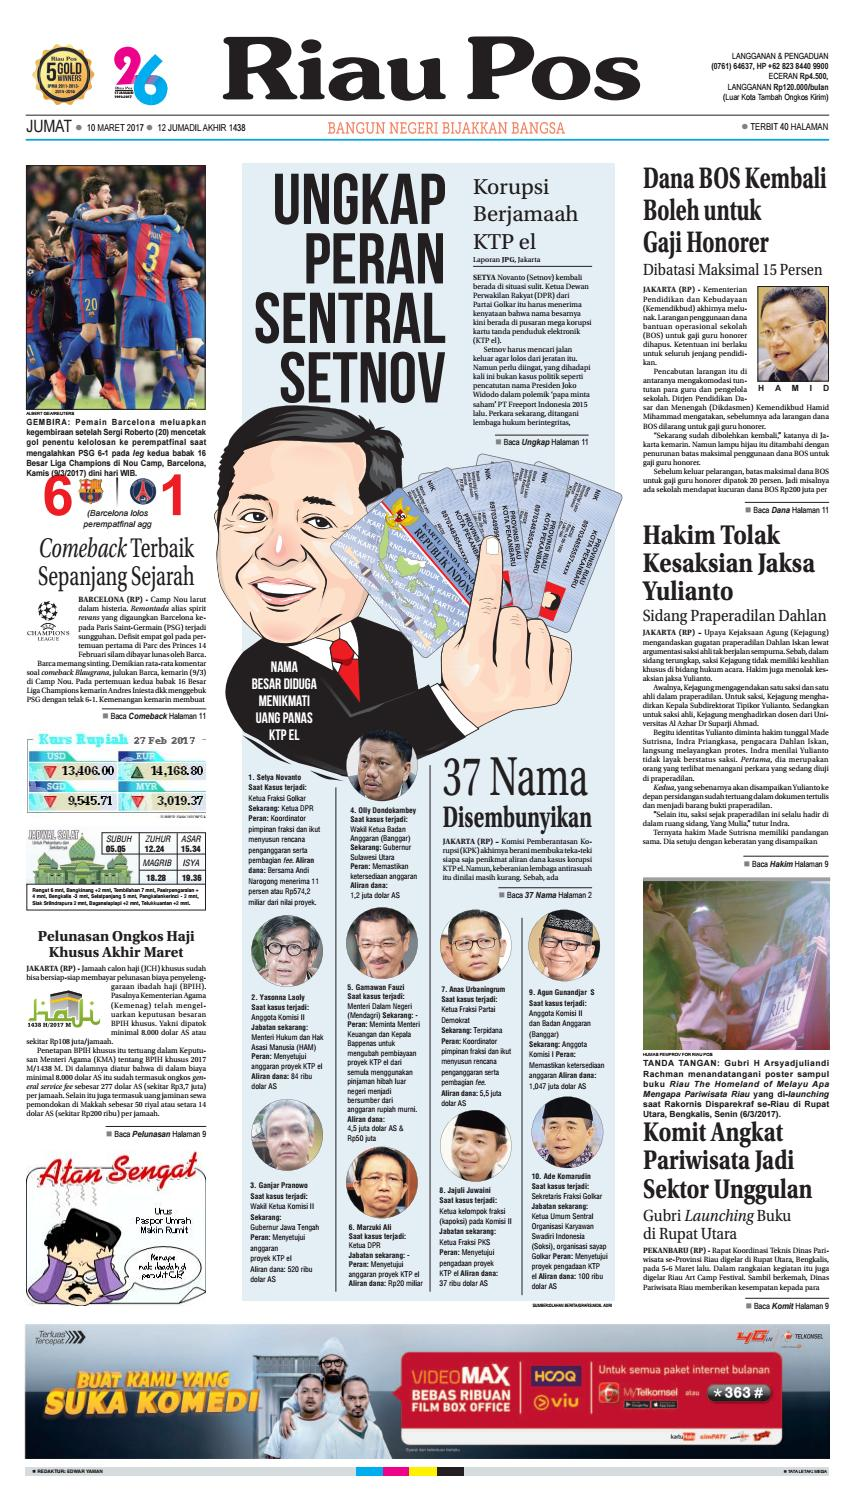 2017 03 10 By Riau Pos Issuu Krezi Kamis 25 Baju Koko Al Achwan Original Banyak Model